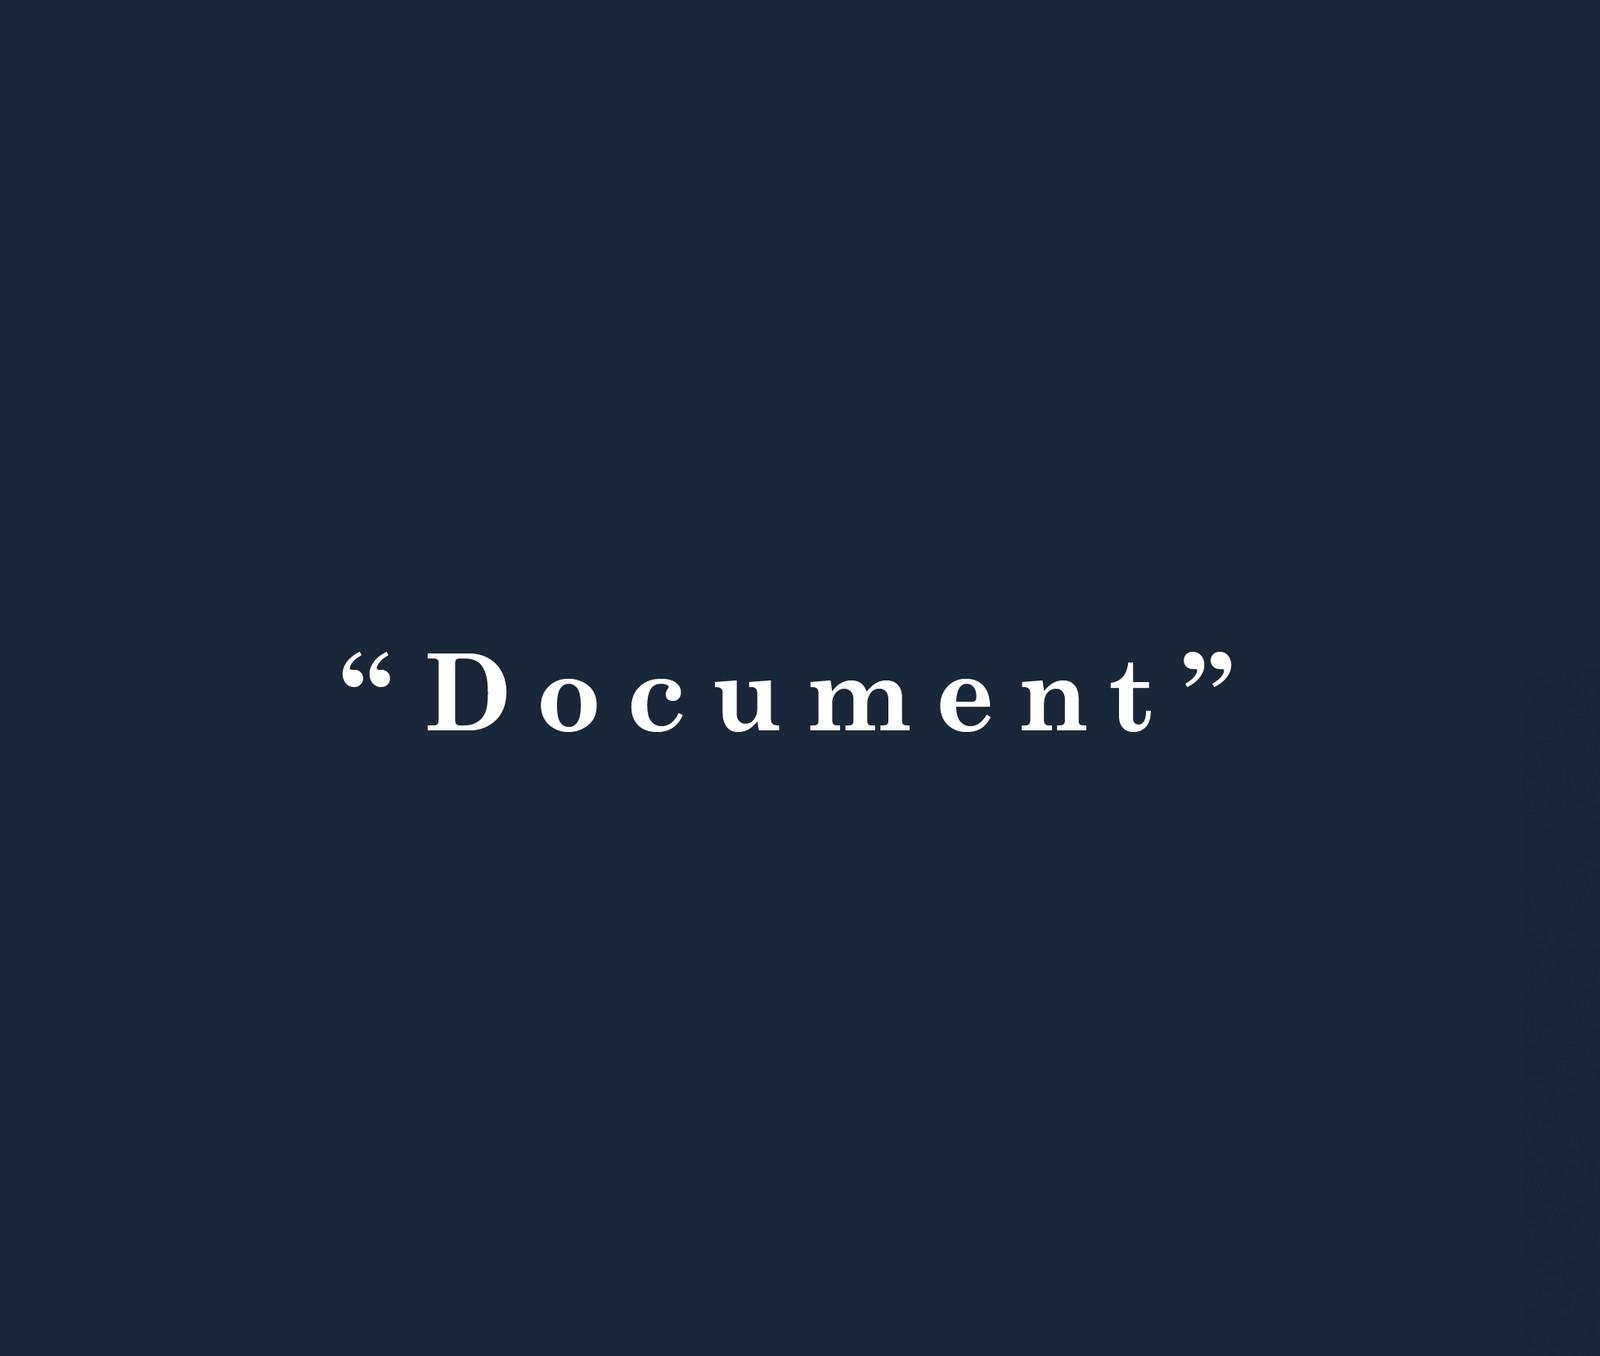 Documentfront